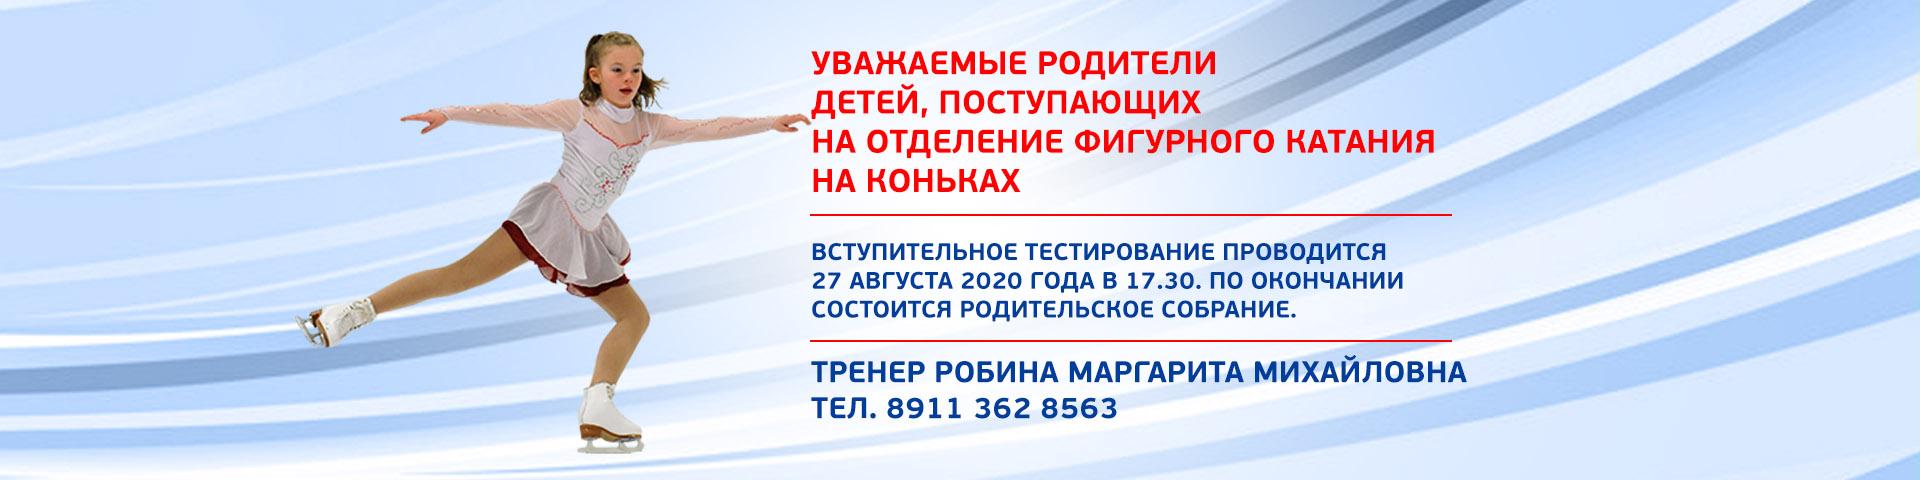 banner-08-2020-sobranie-figurnoe